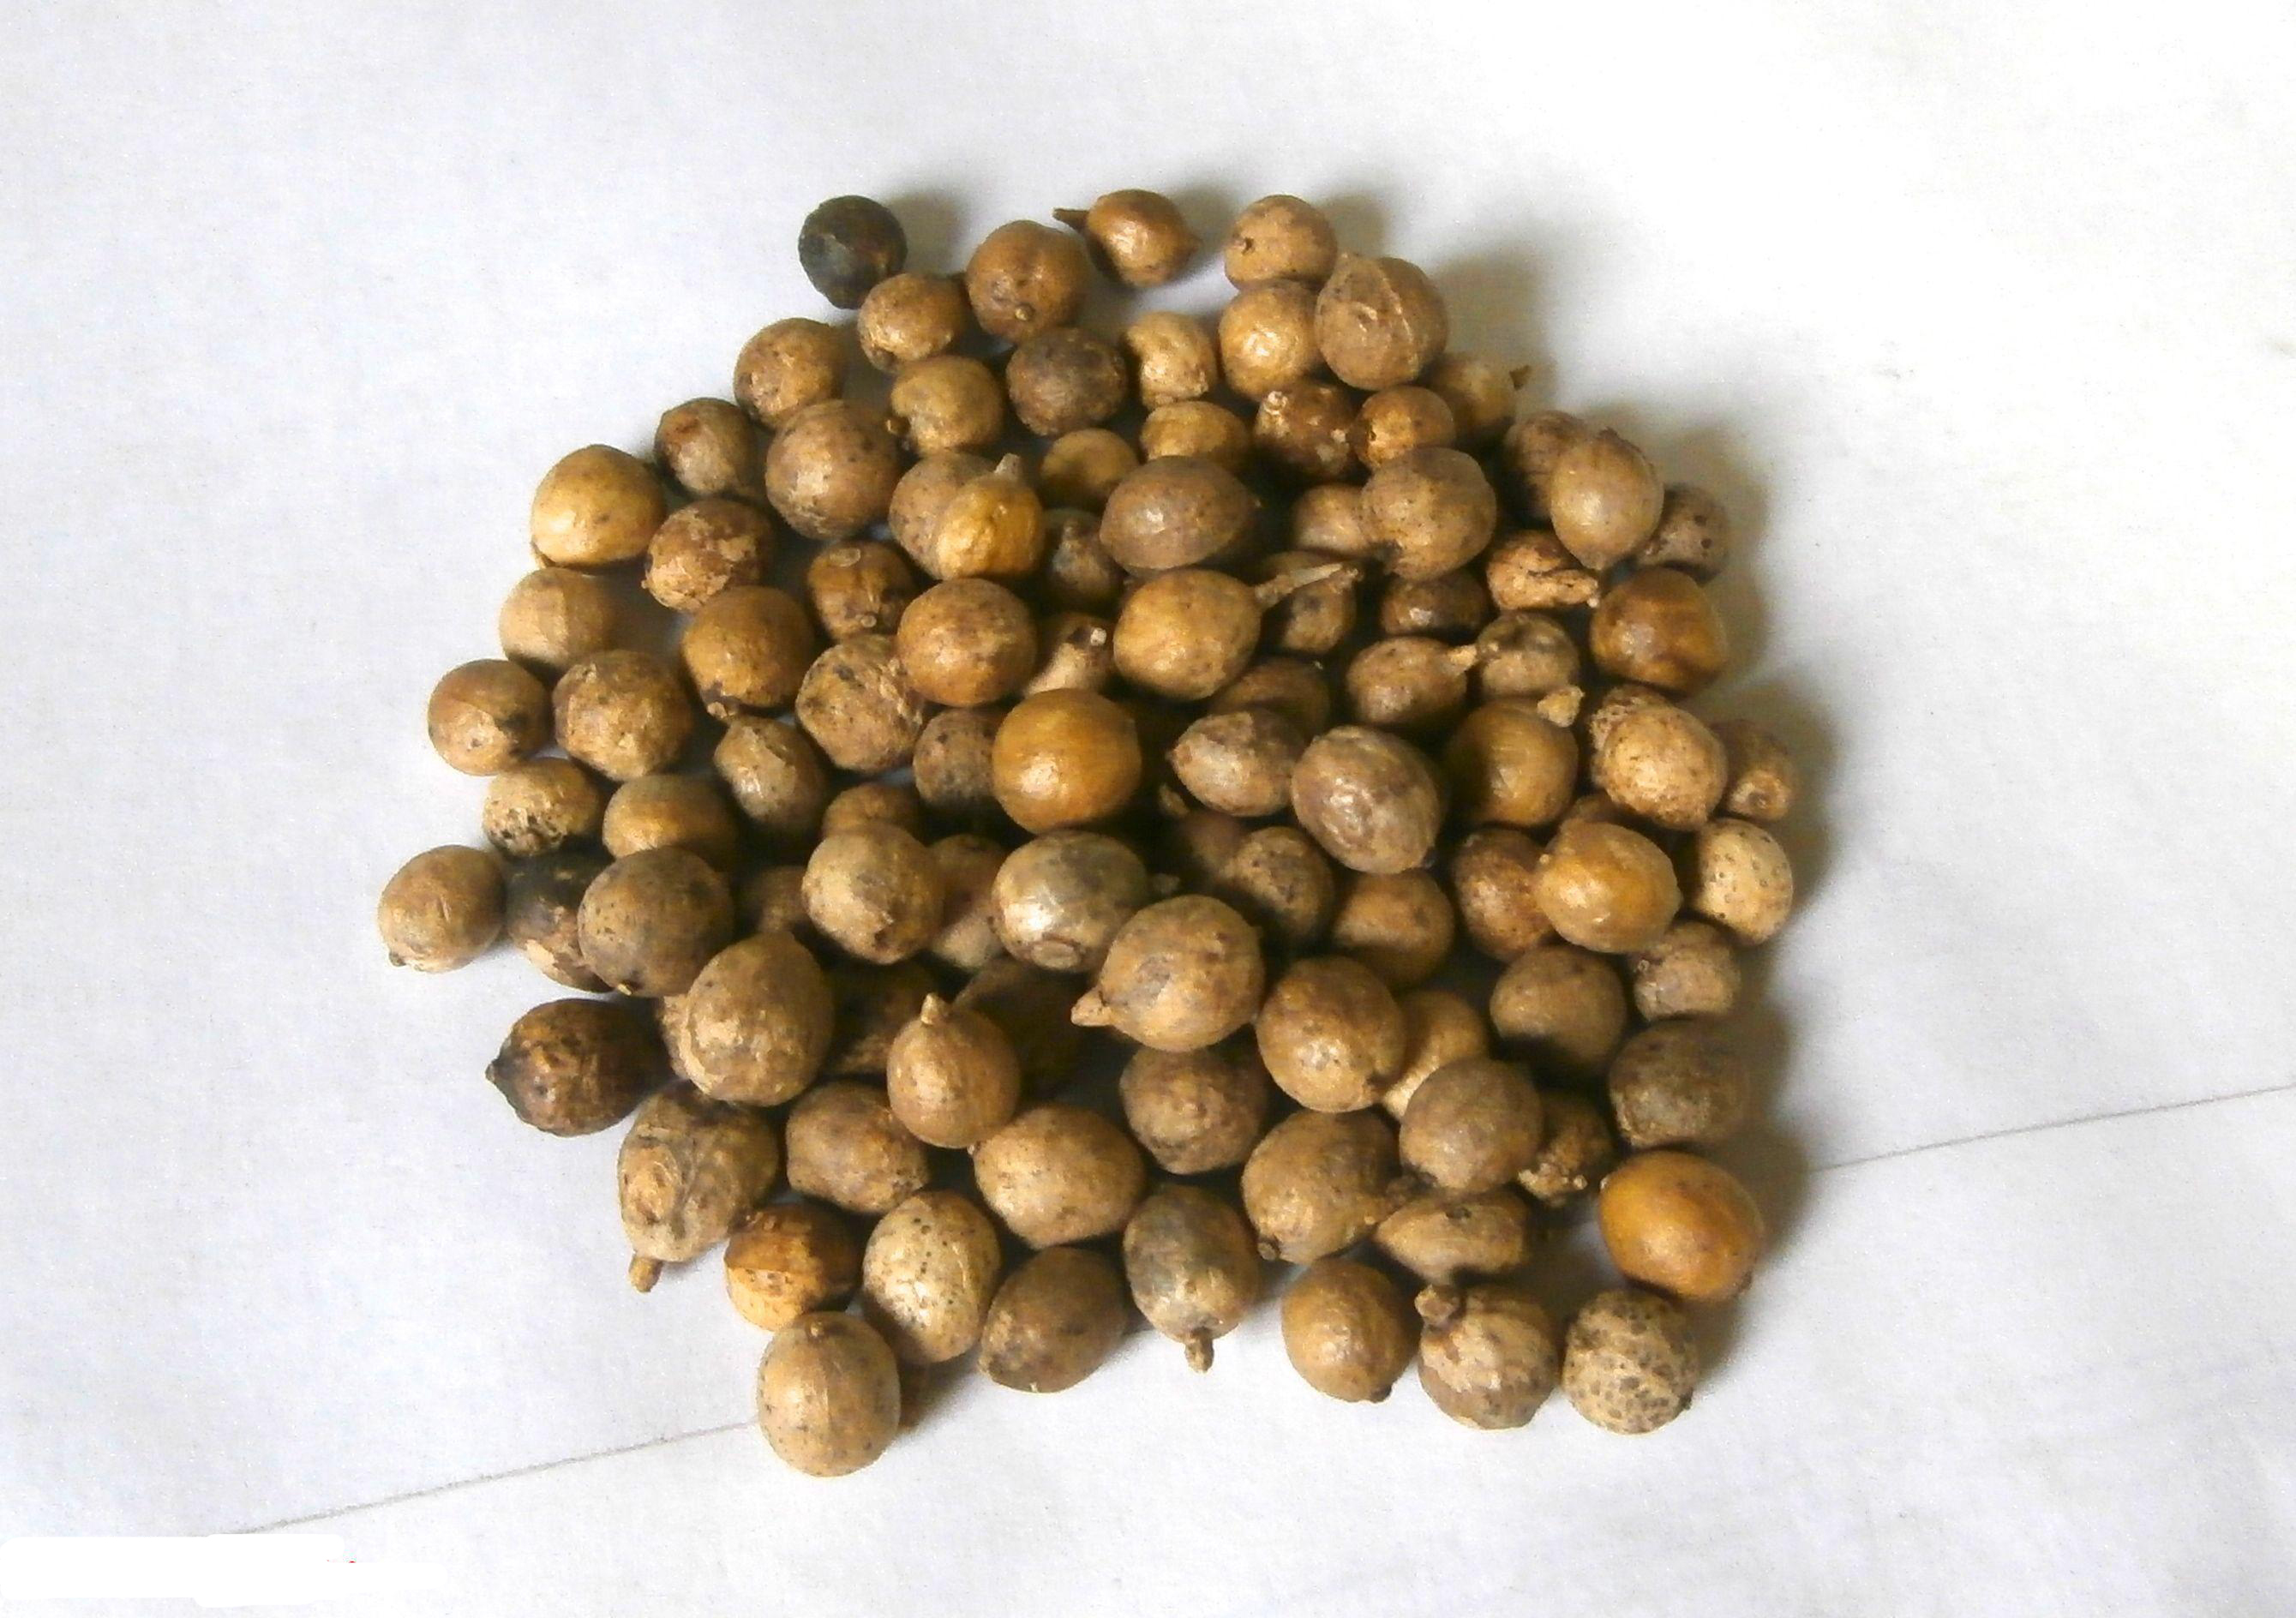 Kale-seeds